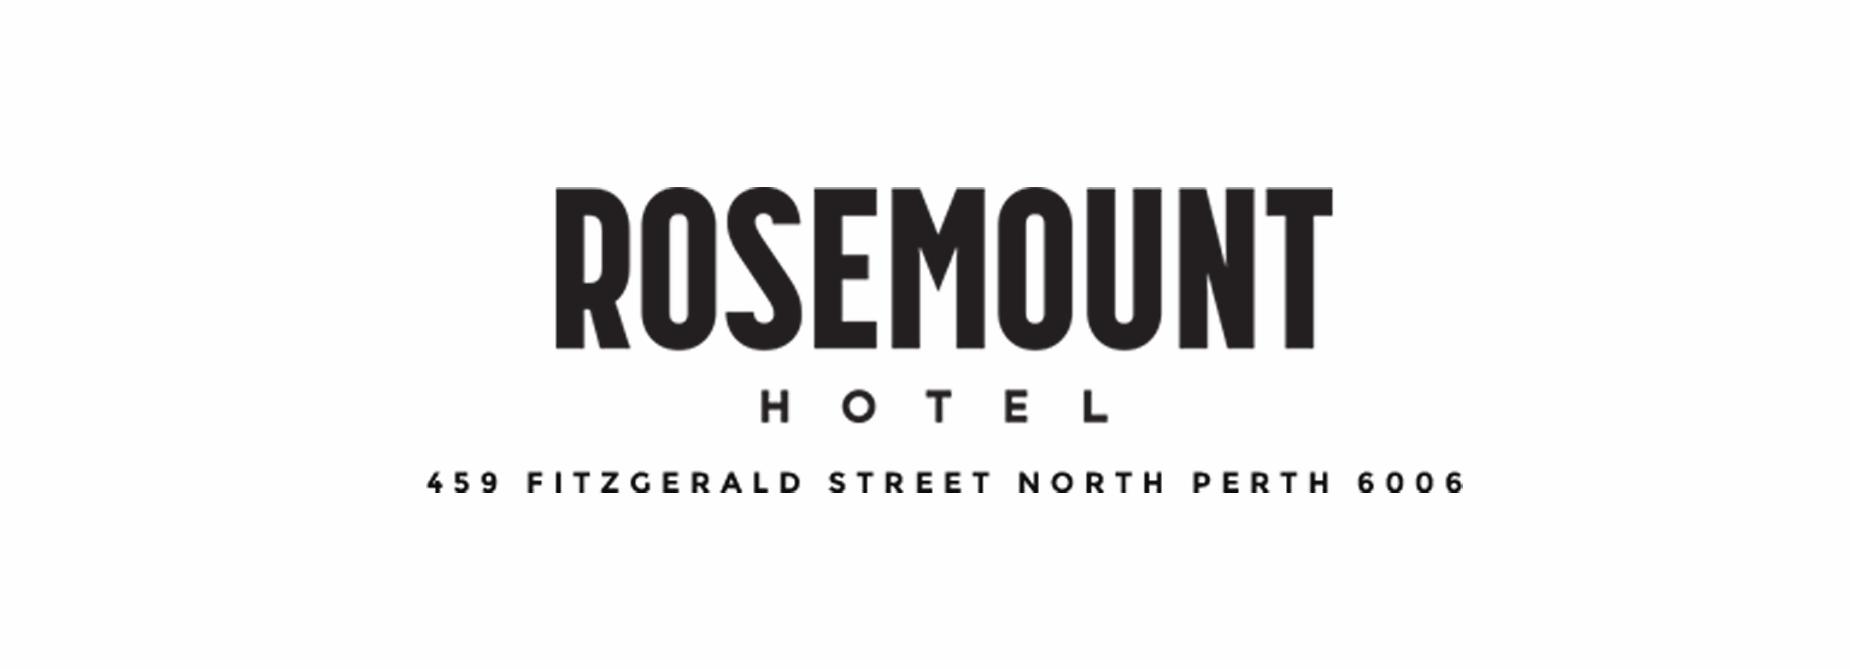 The Rosemount Hotel Logo